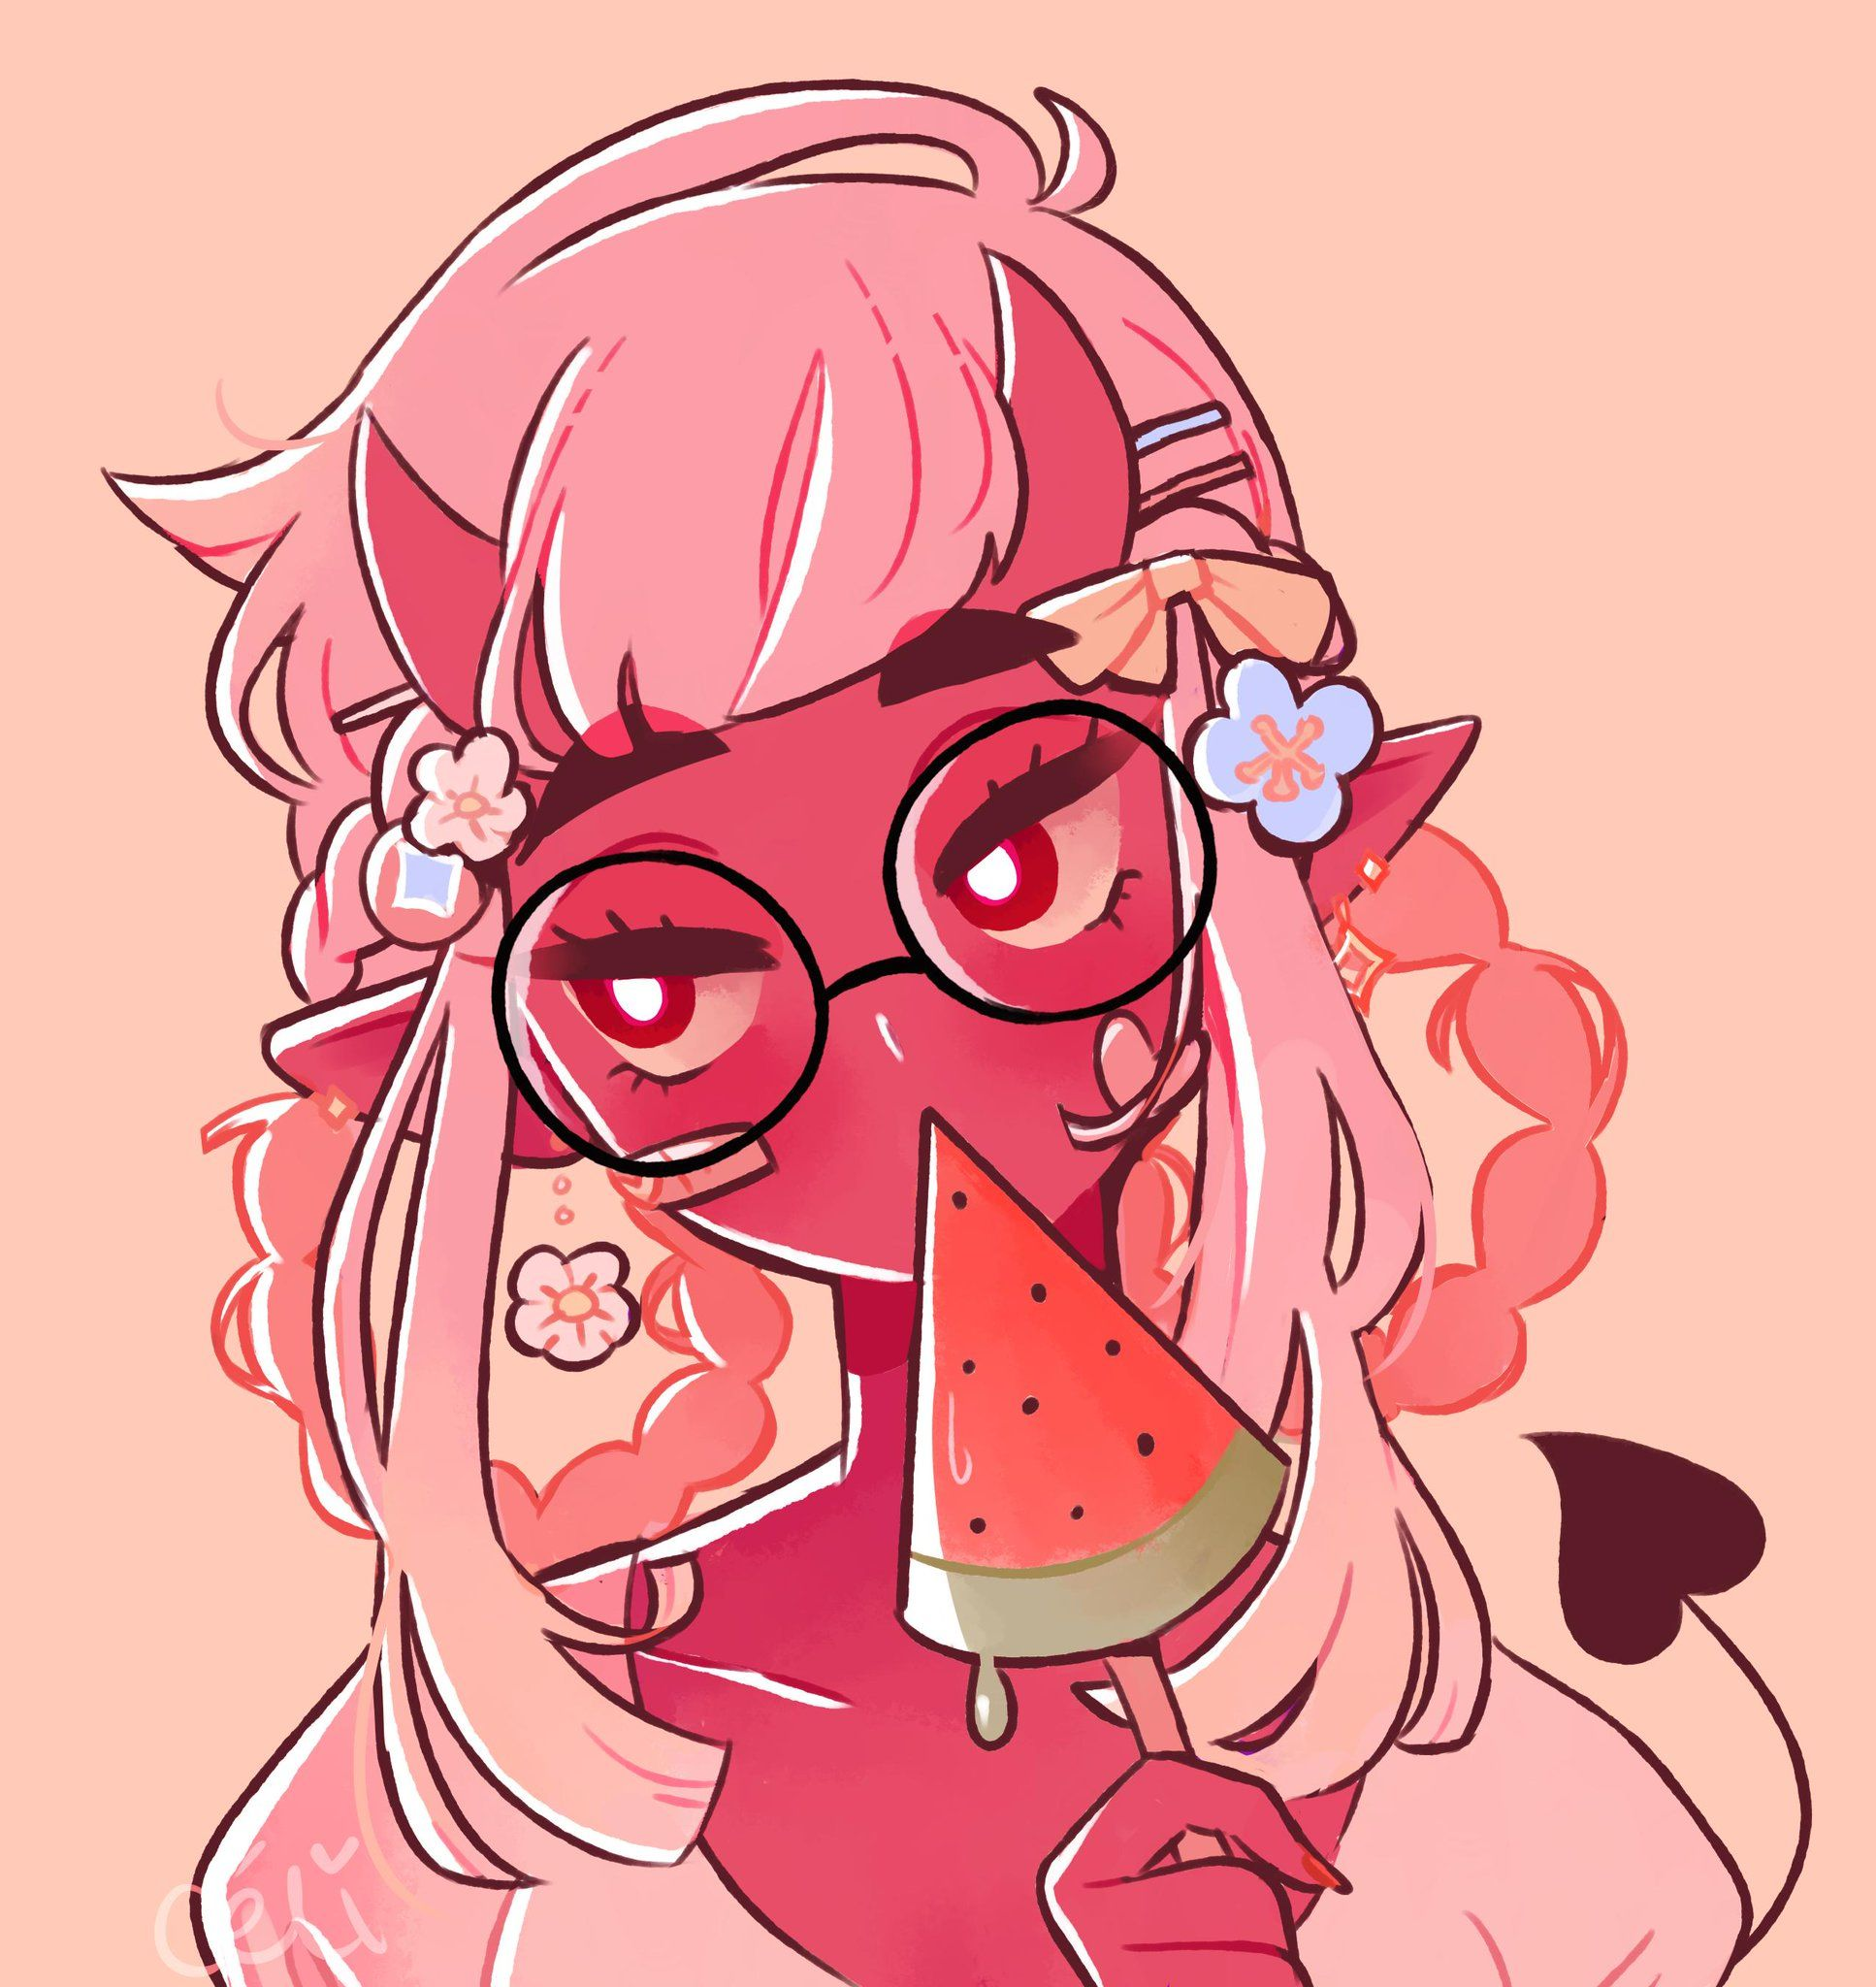 Celi Blacktober On Twitter Cartoon Art Styles Character Art Cute Art